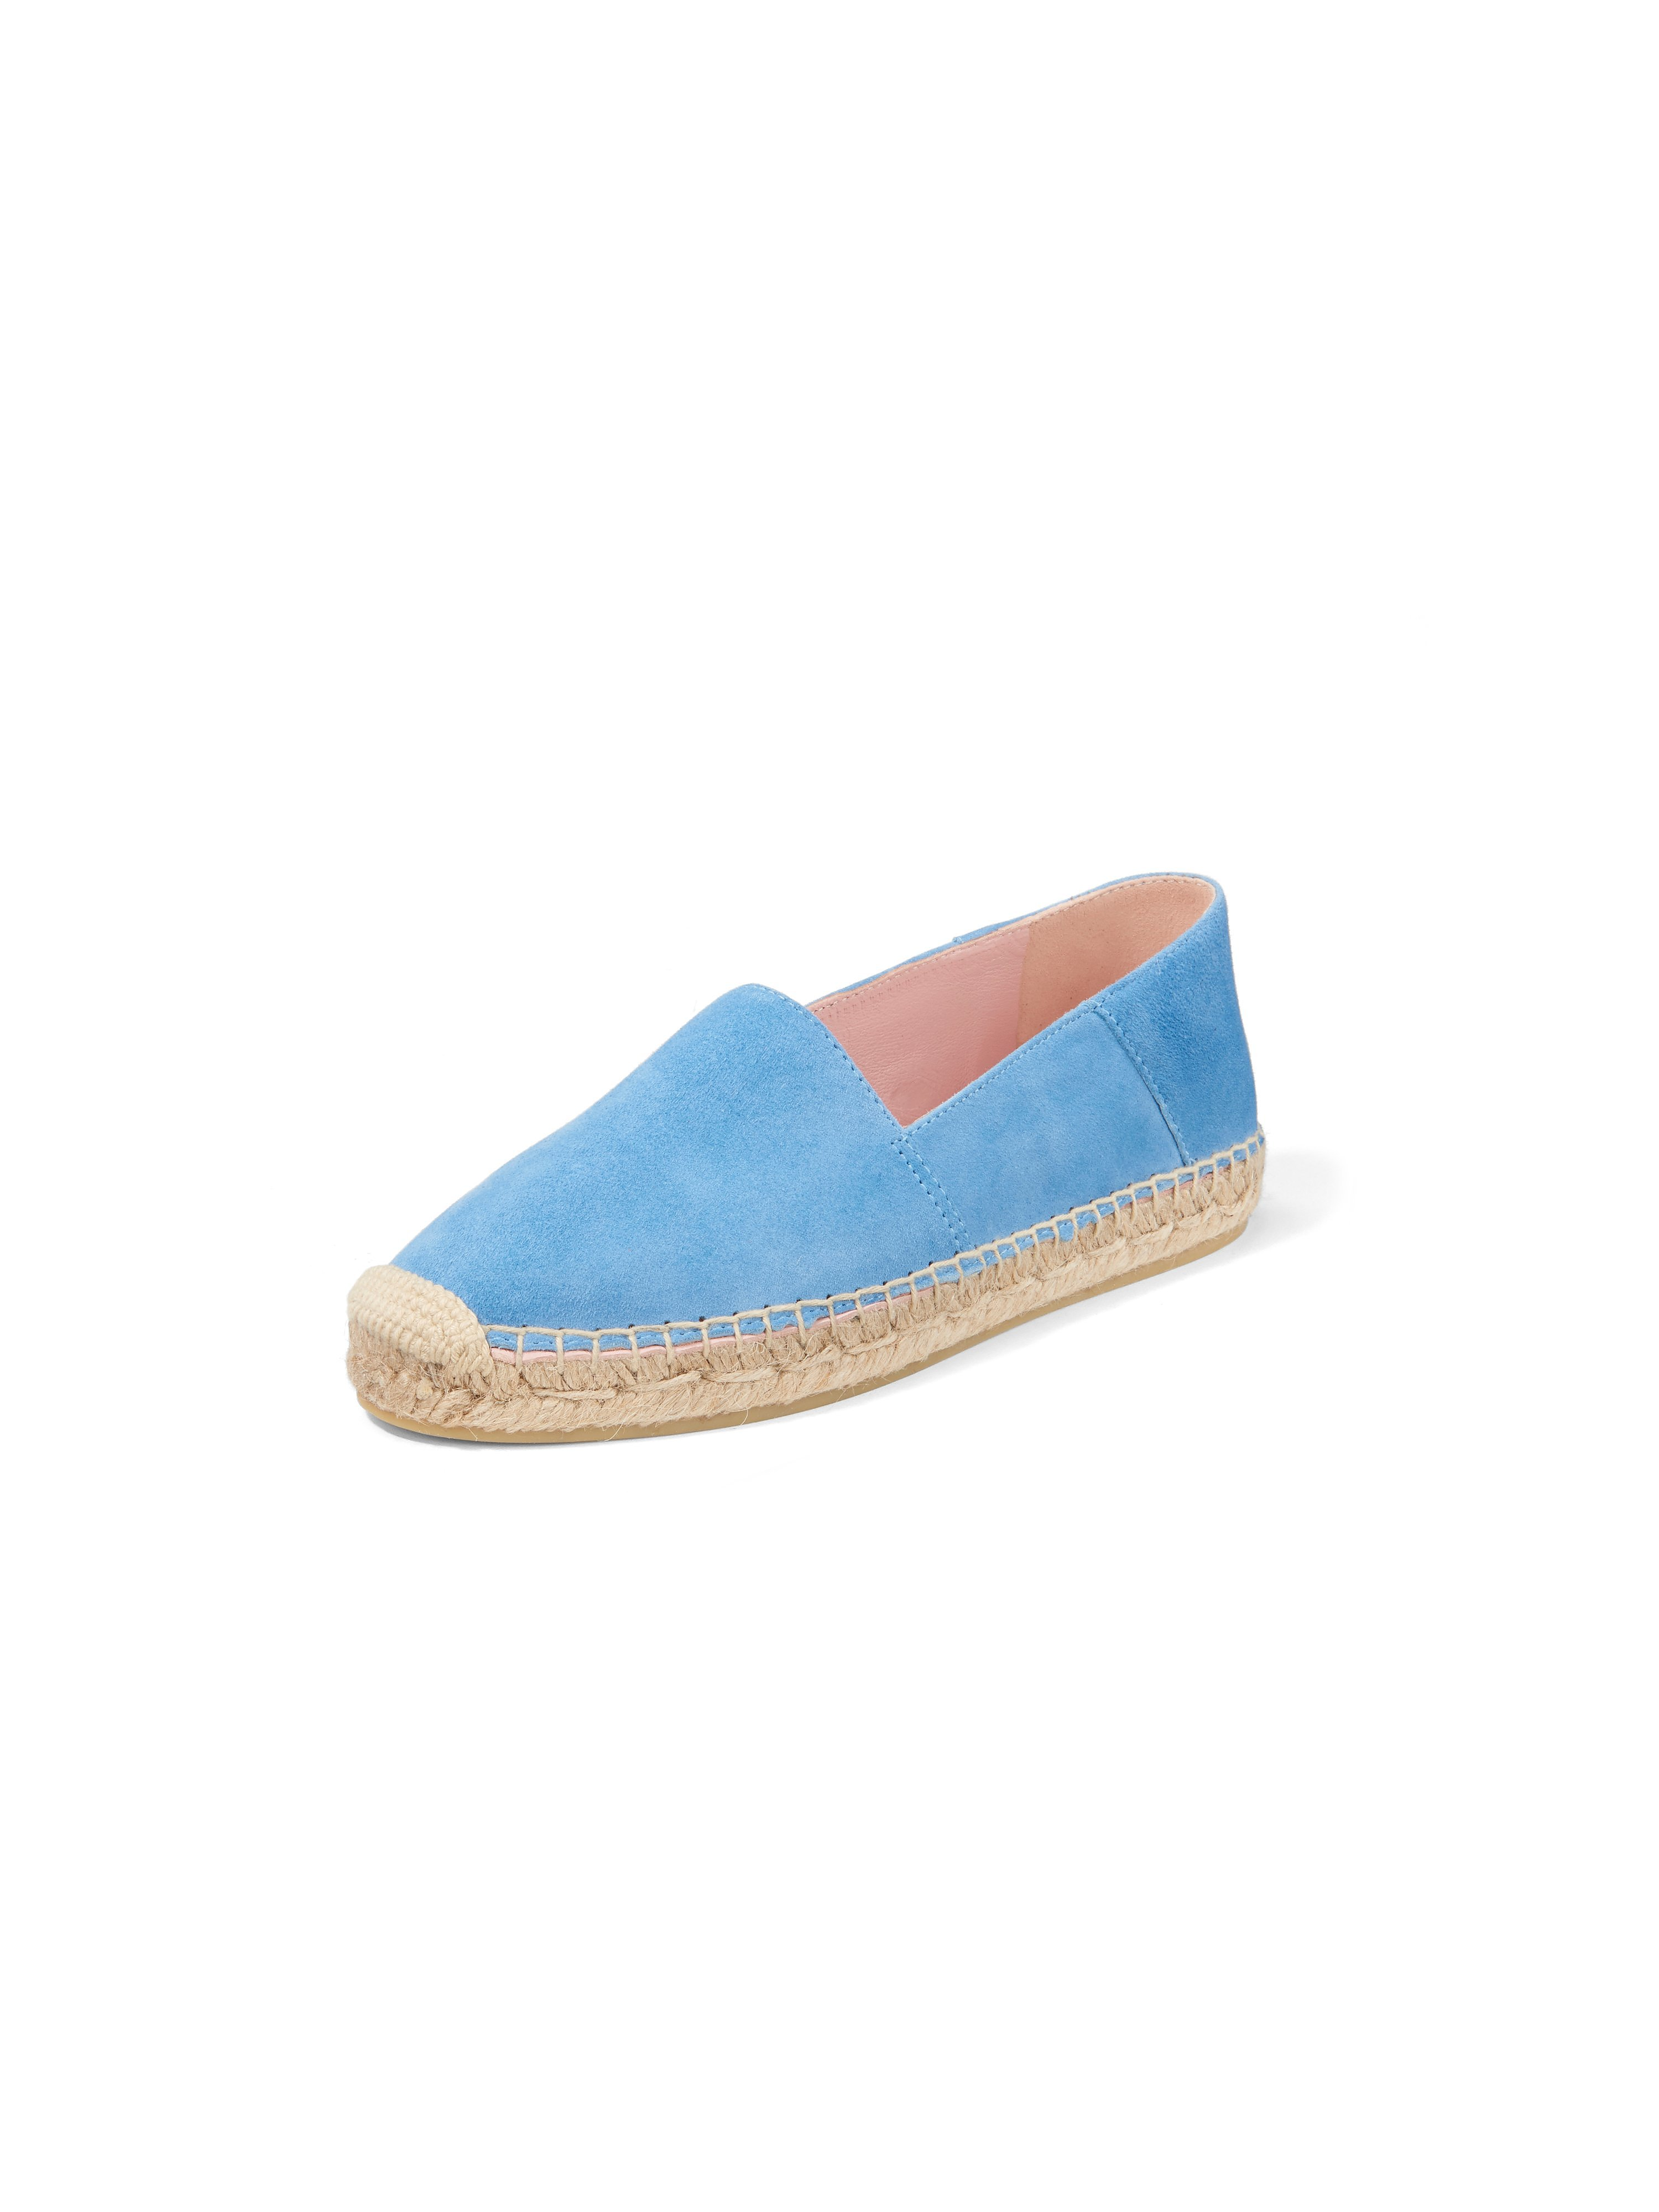 Espadrilles geitensuèdeleer Van Pretty Ballerinas blauw